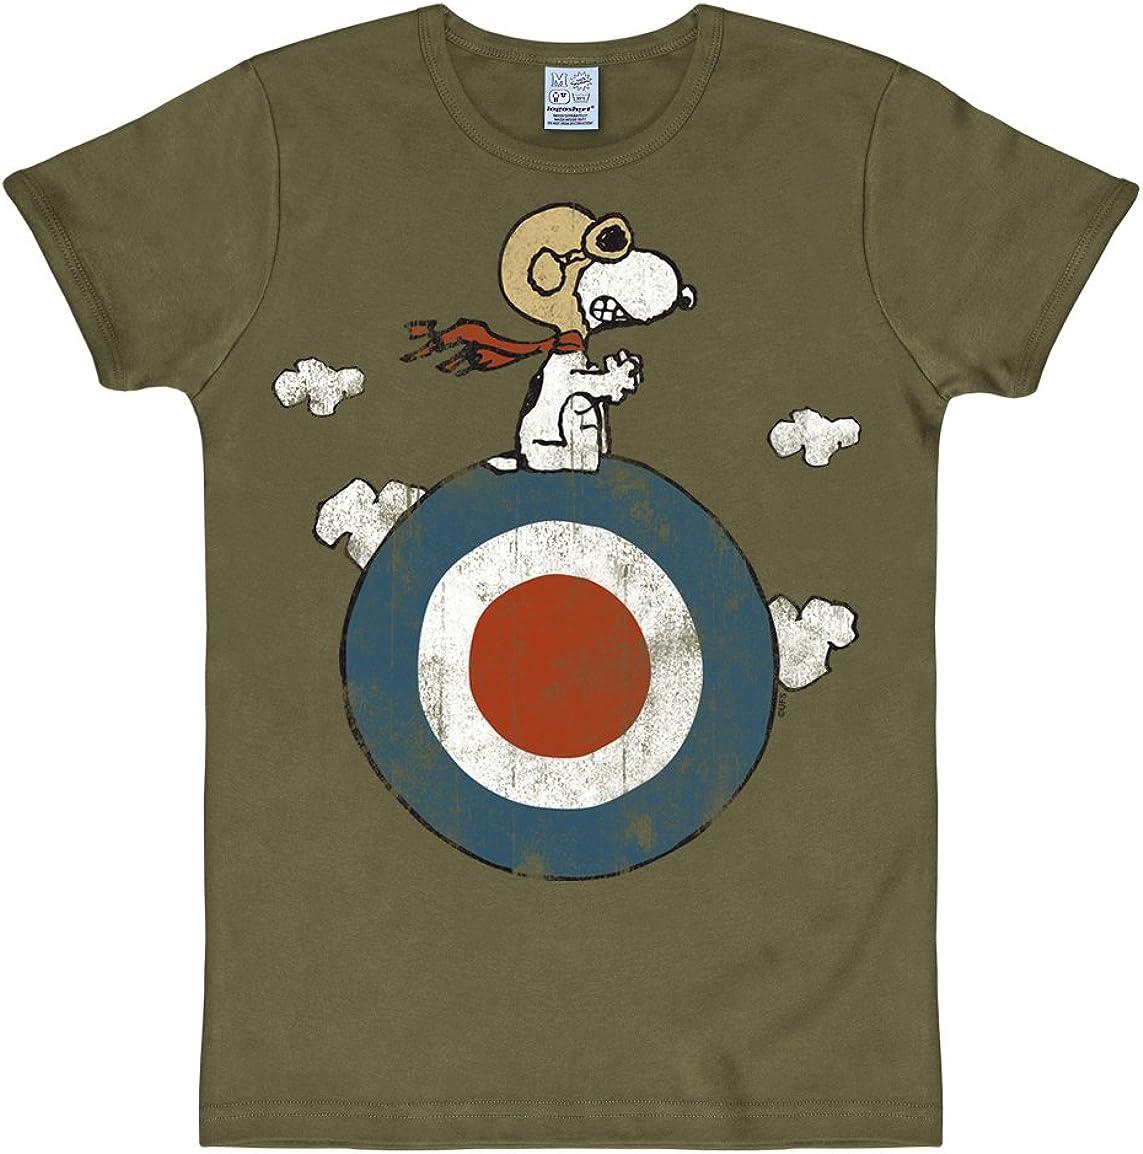 Logoshirt/®️ Peanuts Snoopy Pilot T-Shirt Unisex I Motiv-Shirt gr/ün kurz/ärmlig Rundhalskragen I Lizenziertes Originaldesign I Grafikshirt hochwertiger Logo-Print I Baumwolle I Vintage T-Shirt